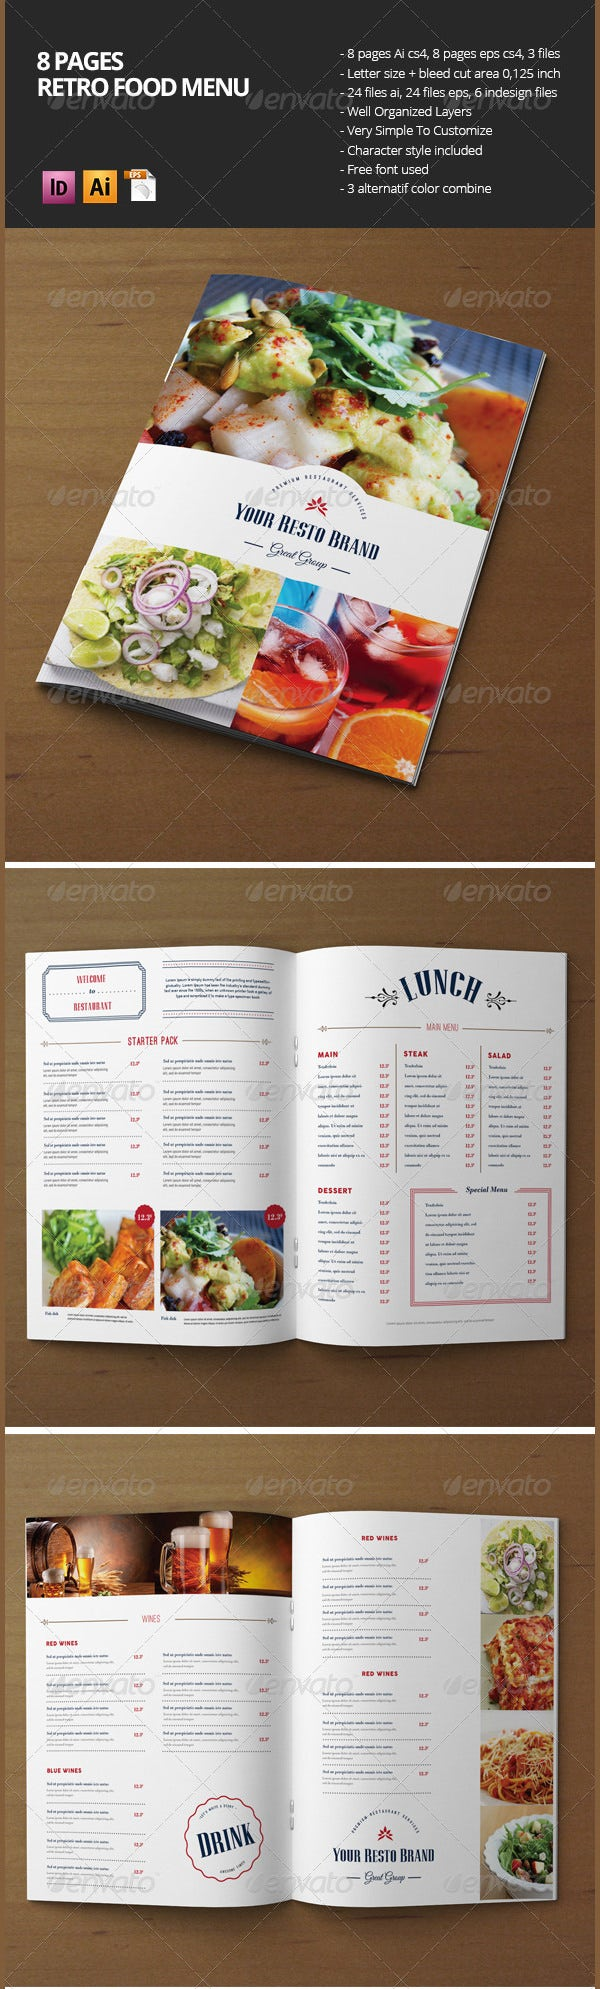 retro food menu brochure 8 pages